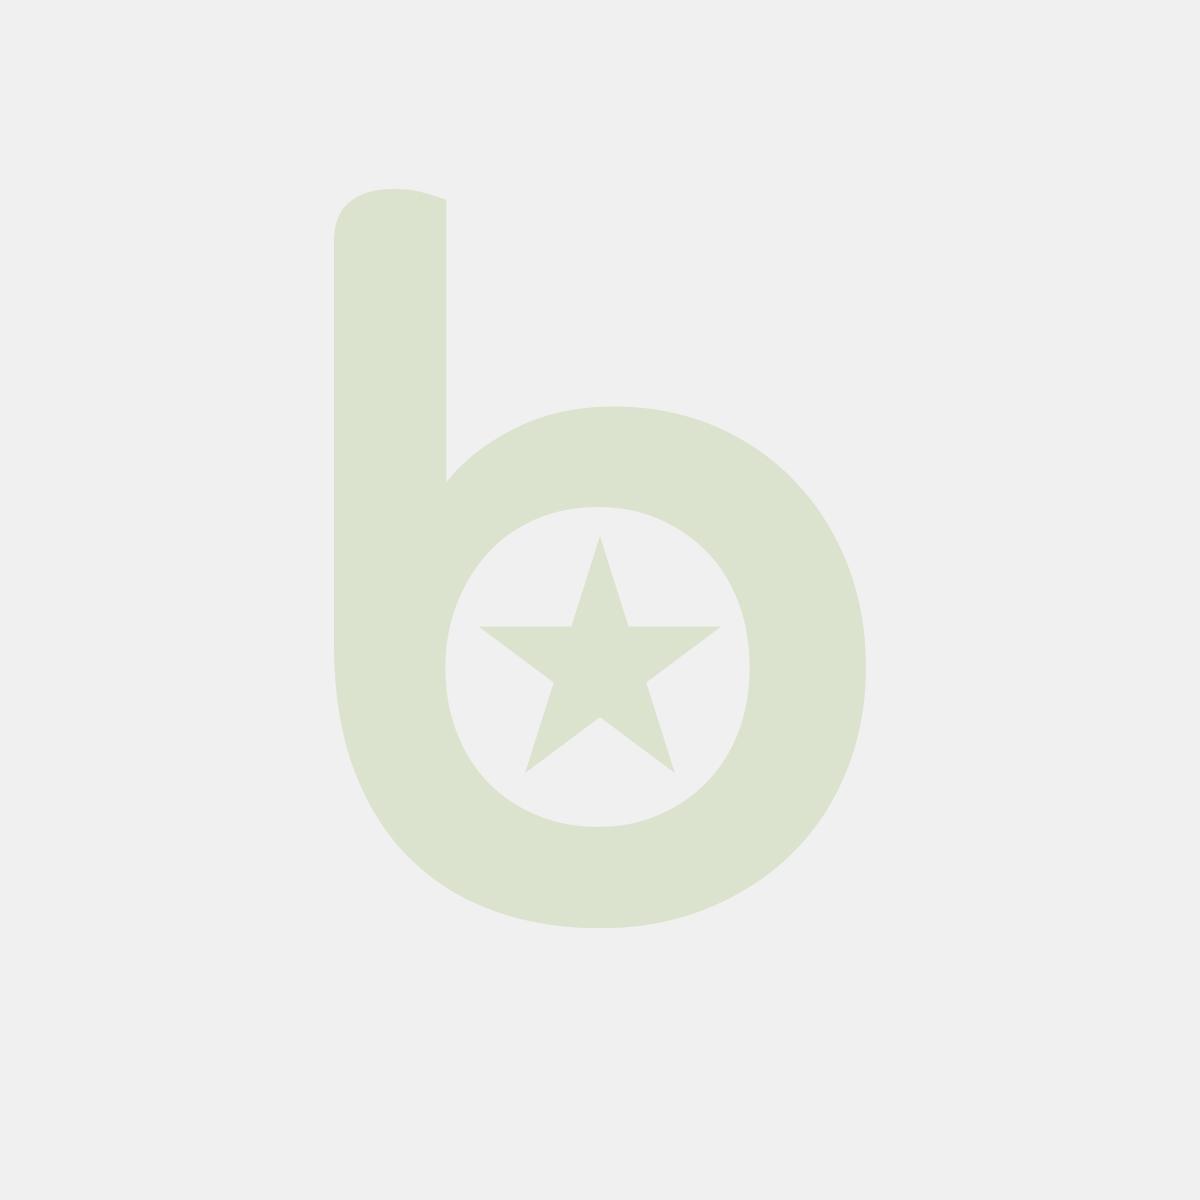 Nadstawa Chłodnicza Gn 1/3 9 X Gn 1/3